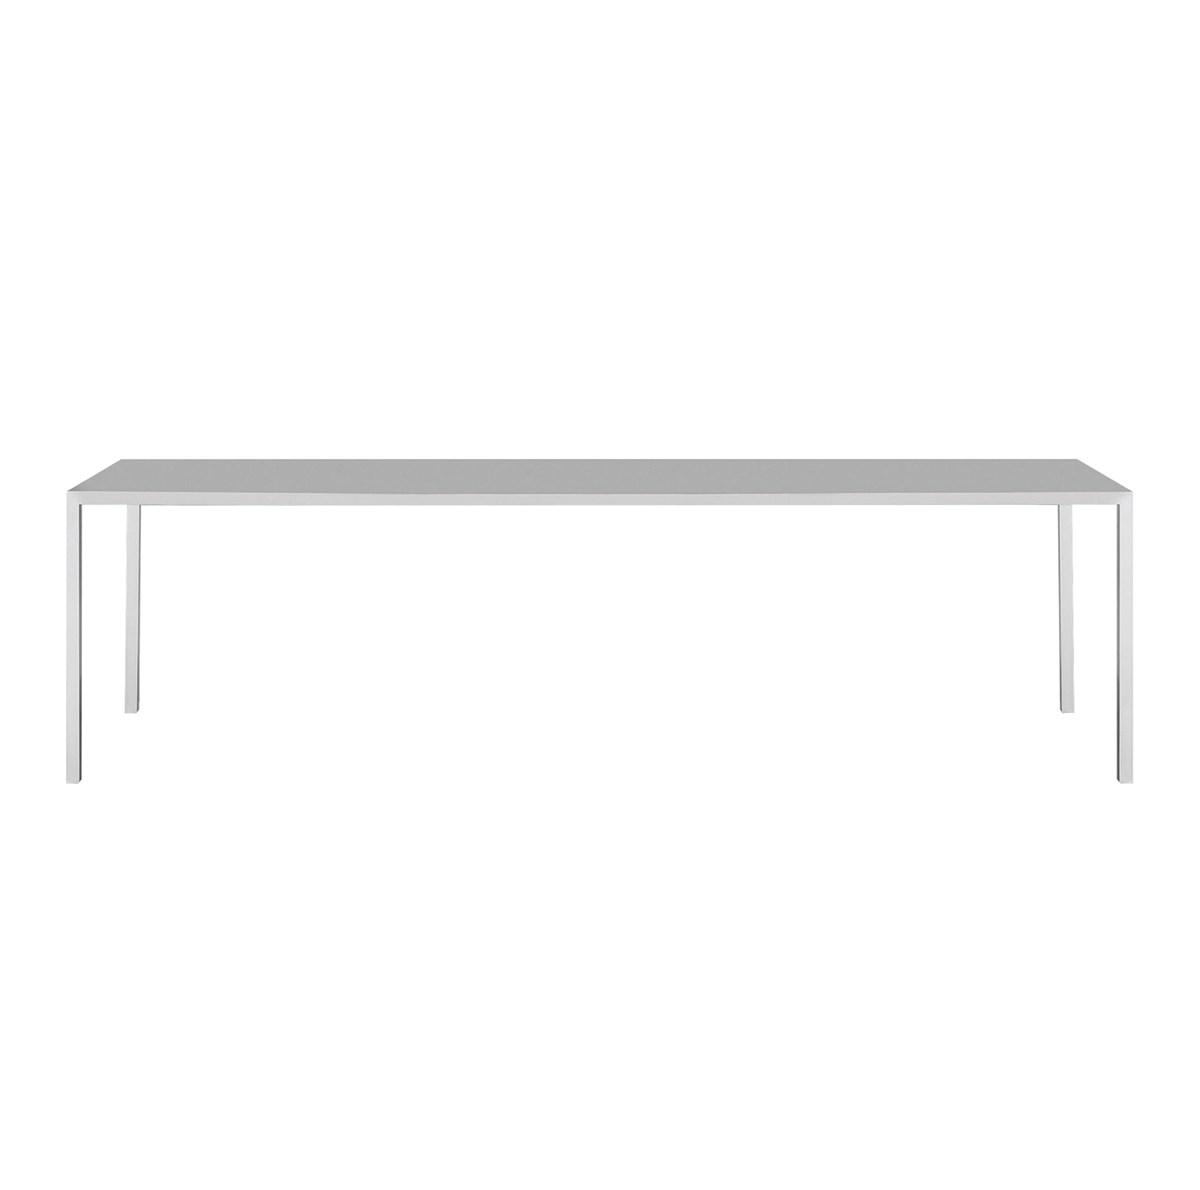 MDF-Italia-Piergiorgio-Cazzaniga-Tense-Table-Matisse-1